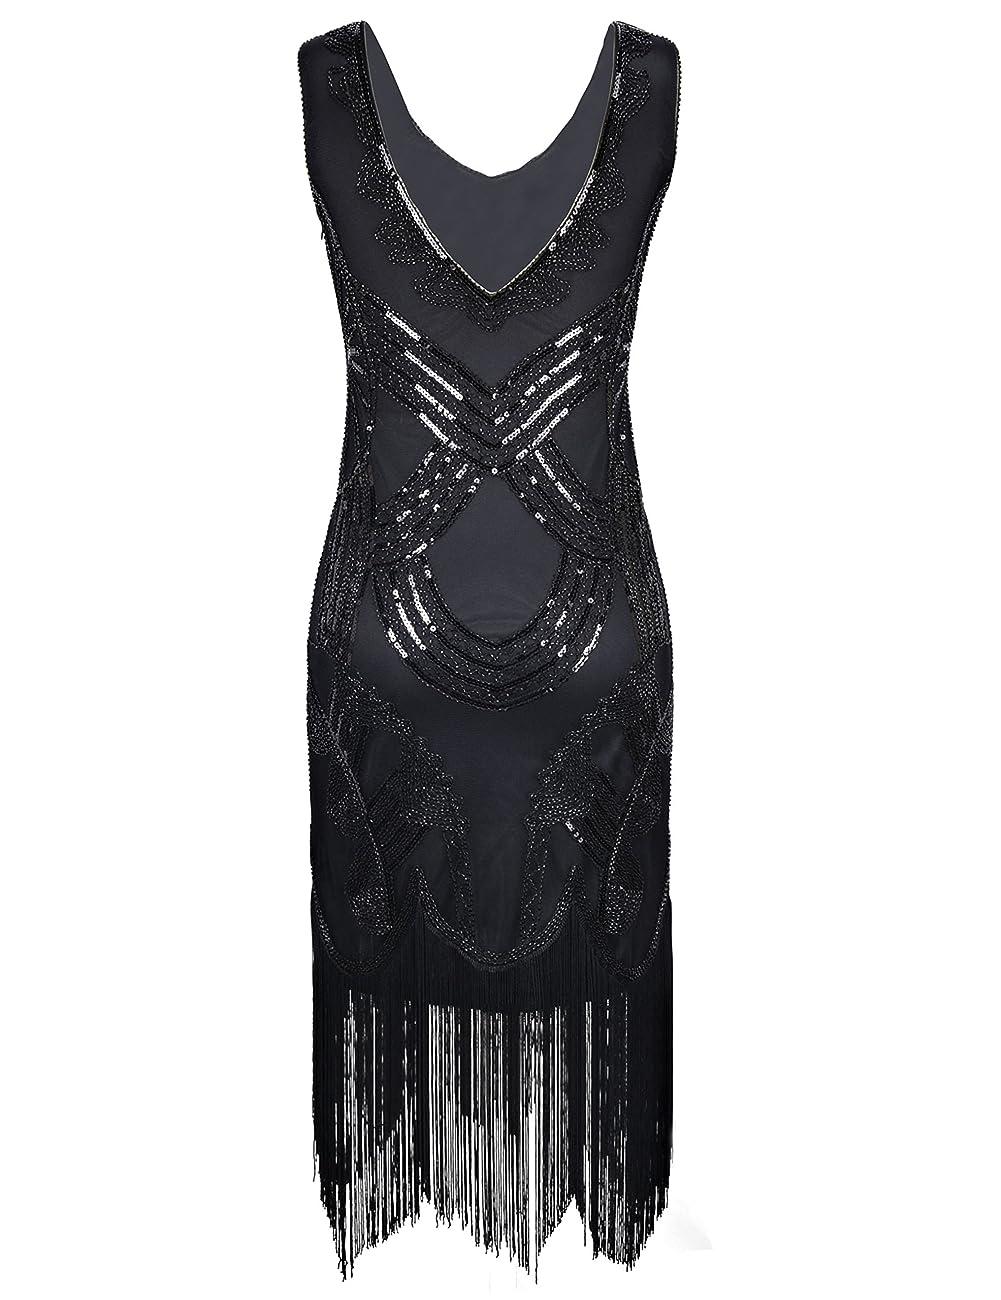 PrettyGuide Women's 1920s Gatsby Art Deco Beads Fringed Cocktail Flapper Dress 1